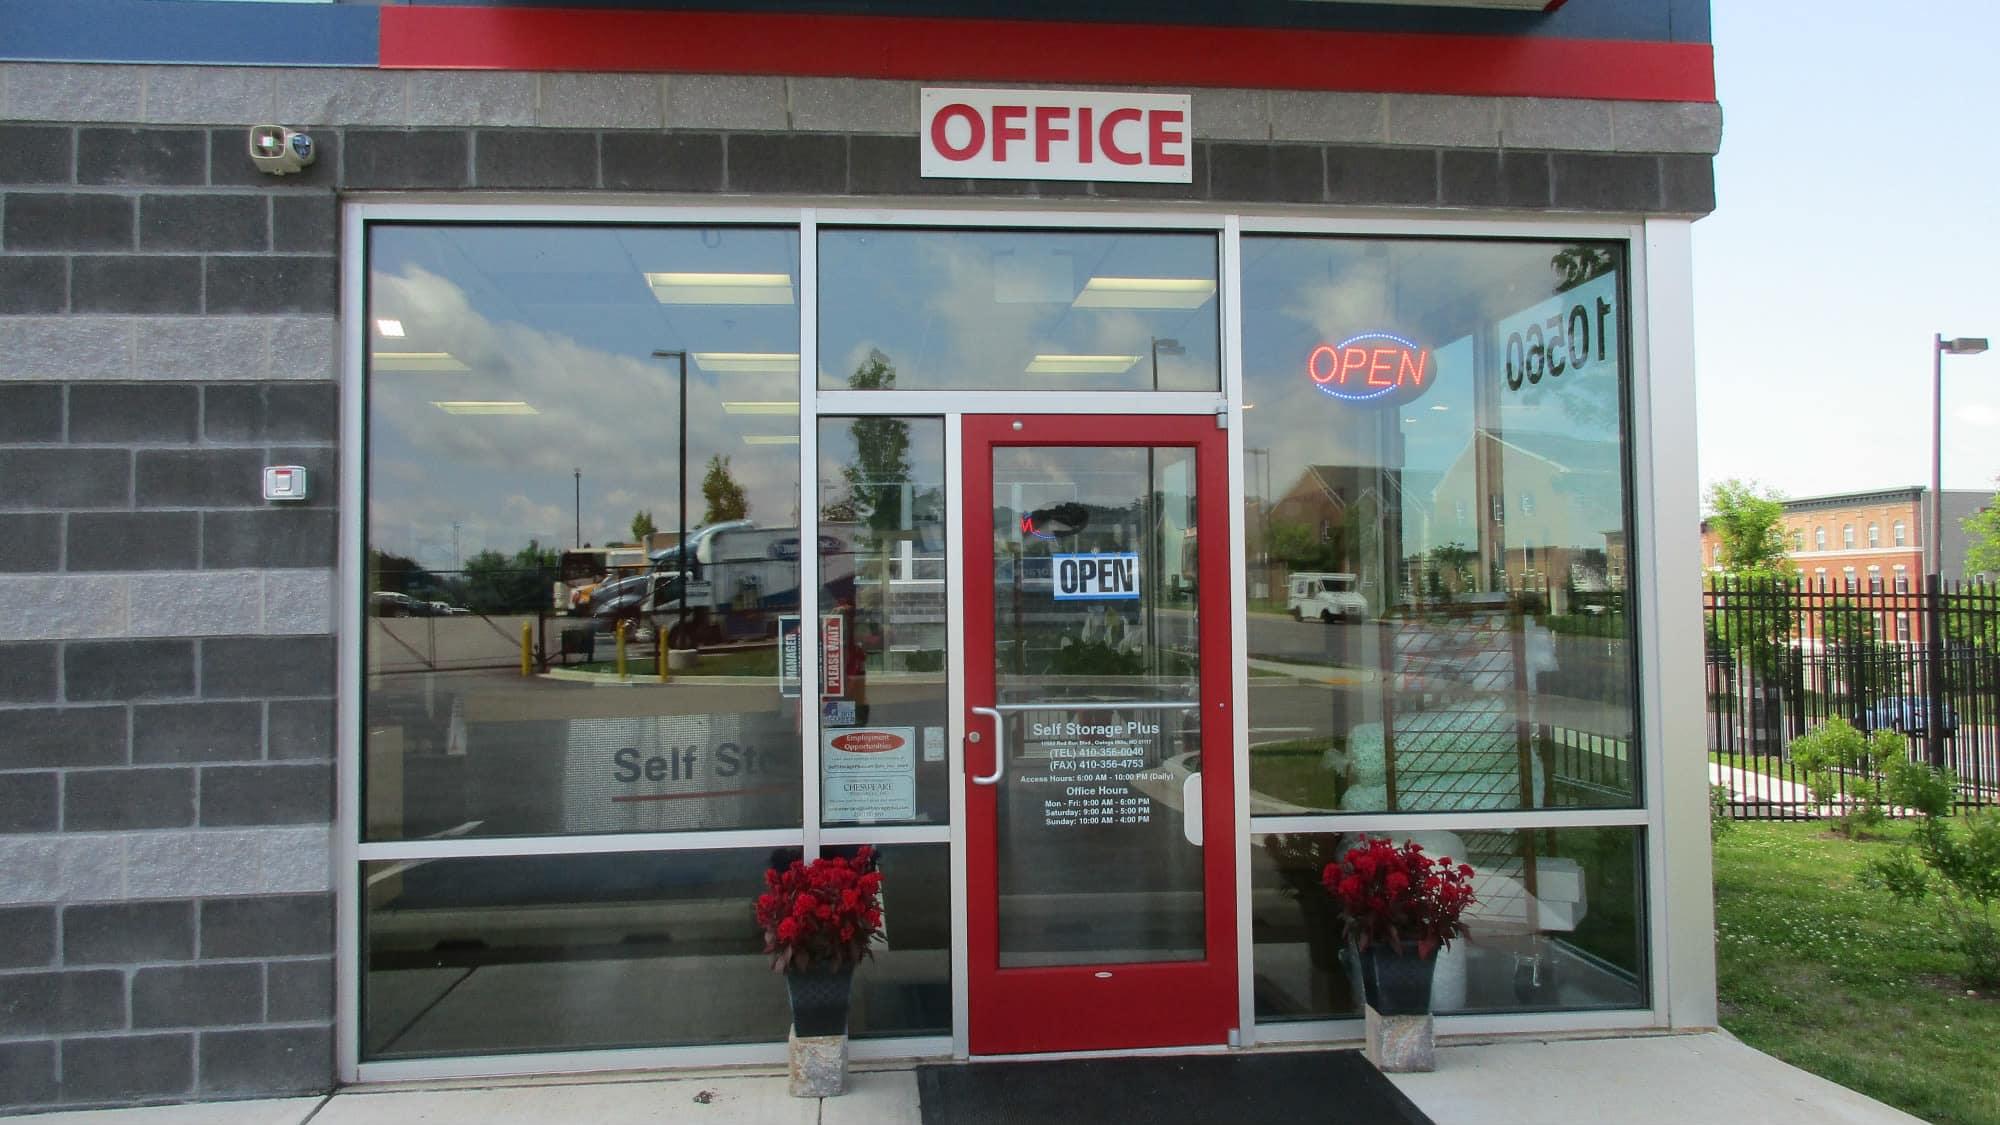 Front door to Self Storage Plus in Owings Mills